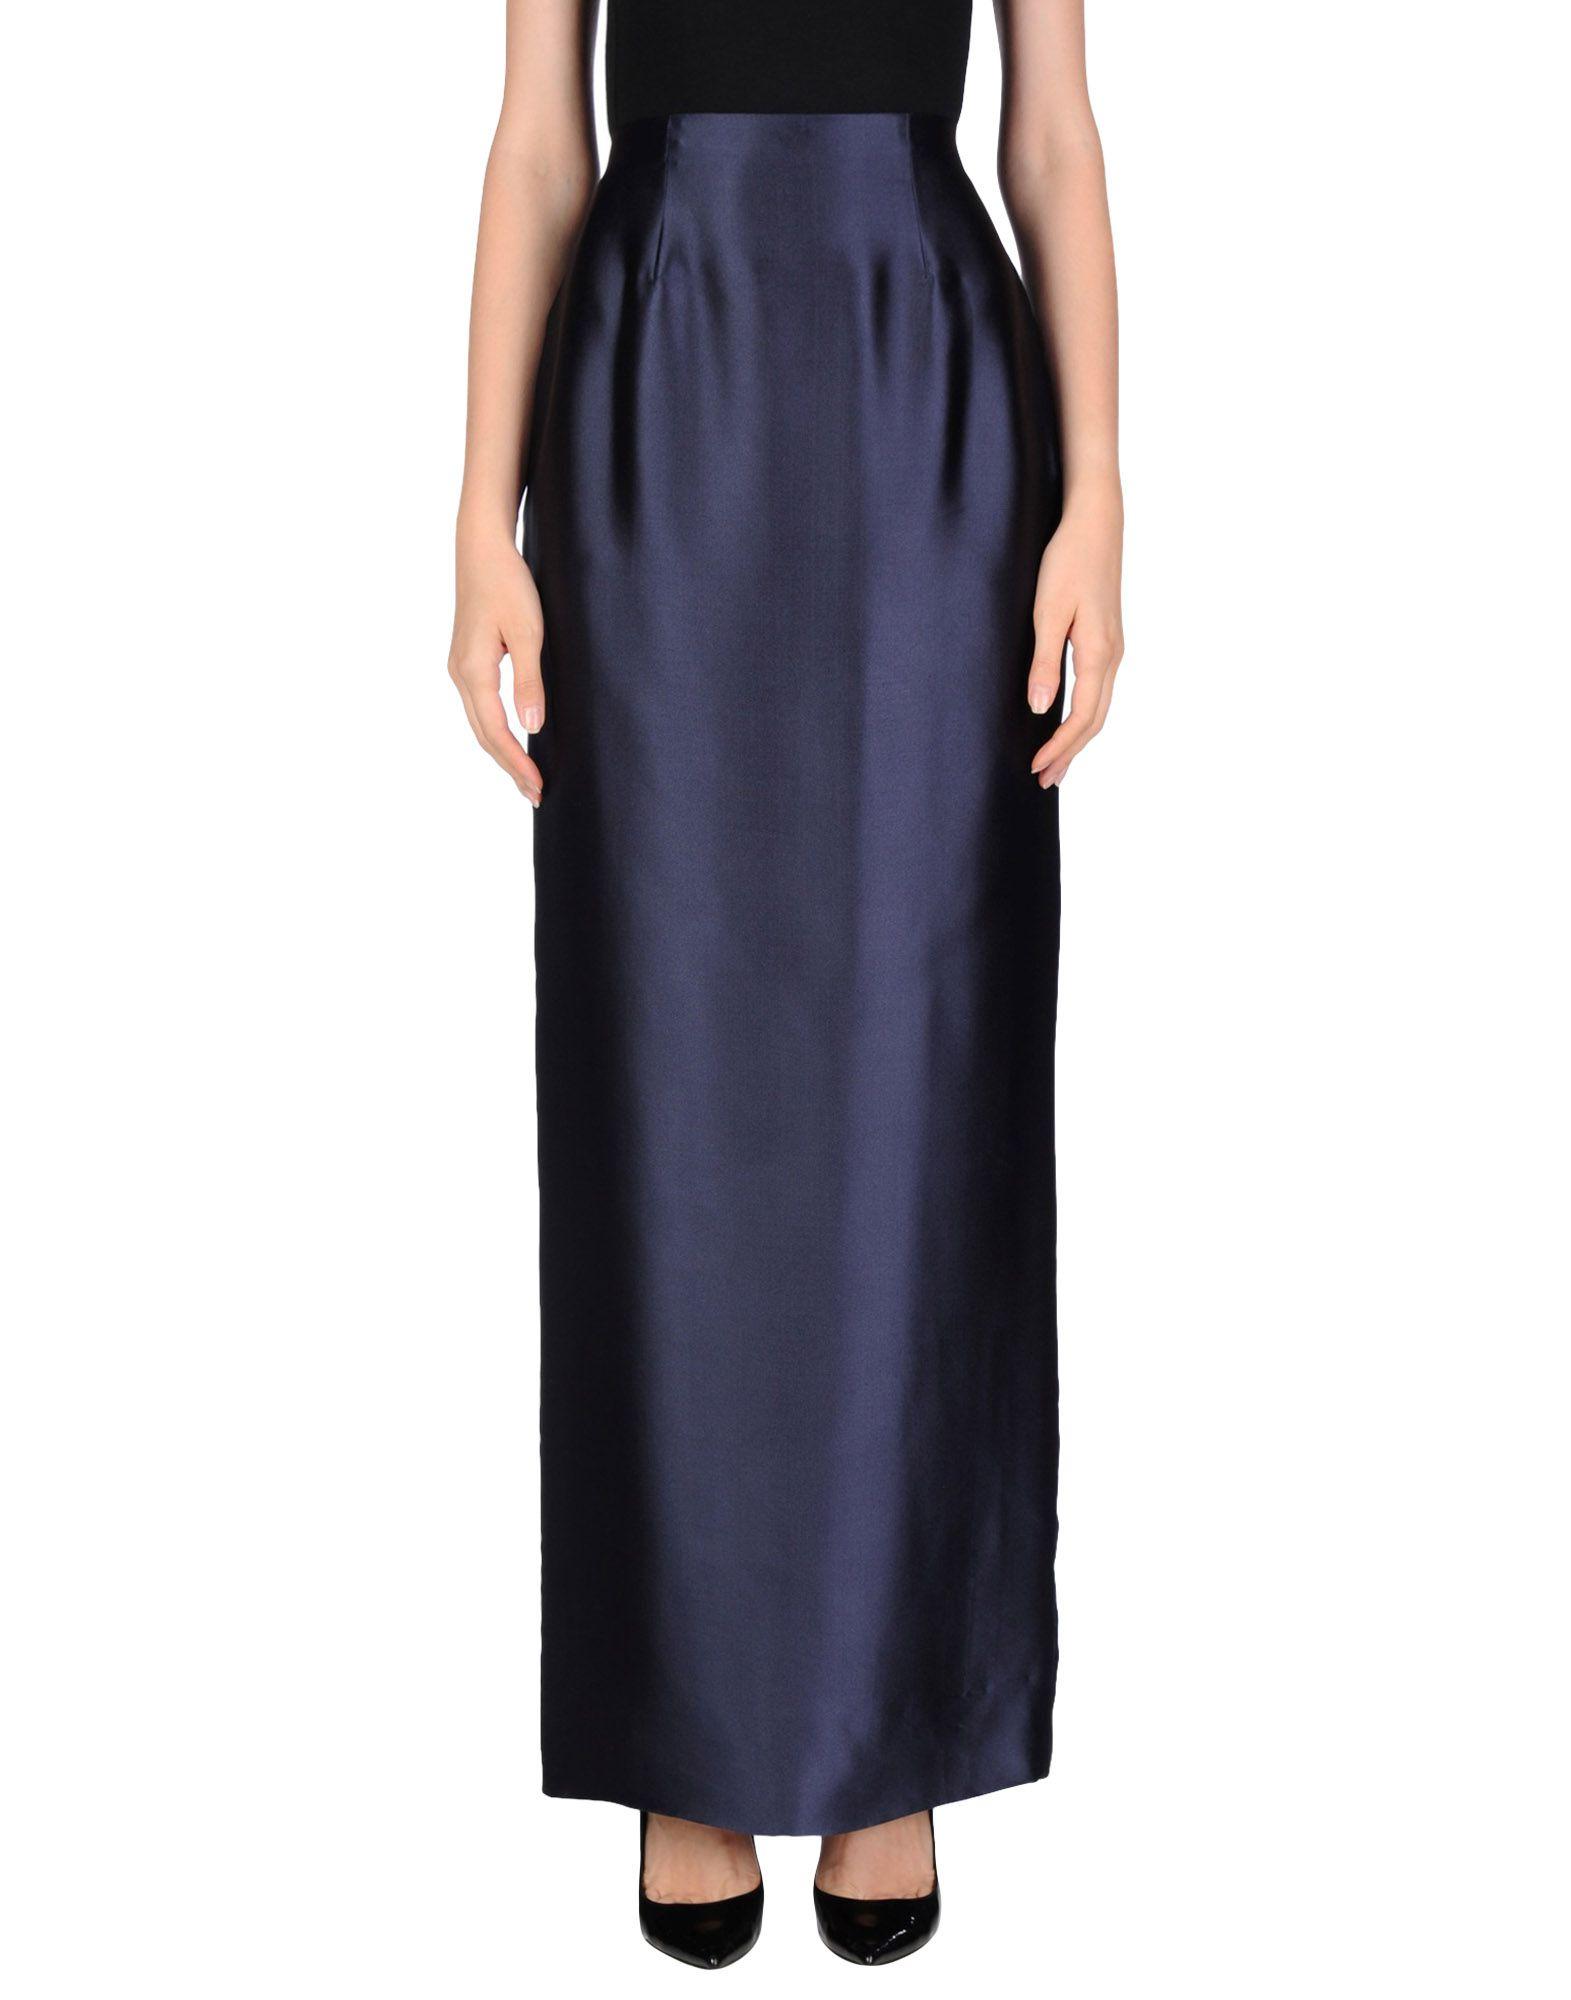 OSCAR DE LA RENTA Длинная юбка miss 0 by oscar de la renta vintage шерстяная юбка 80 е